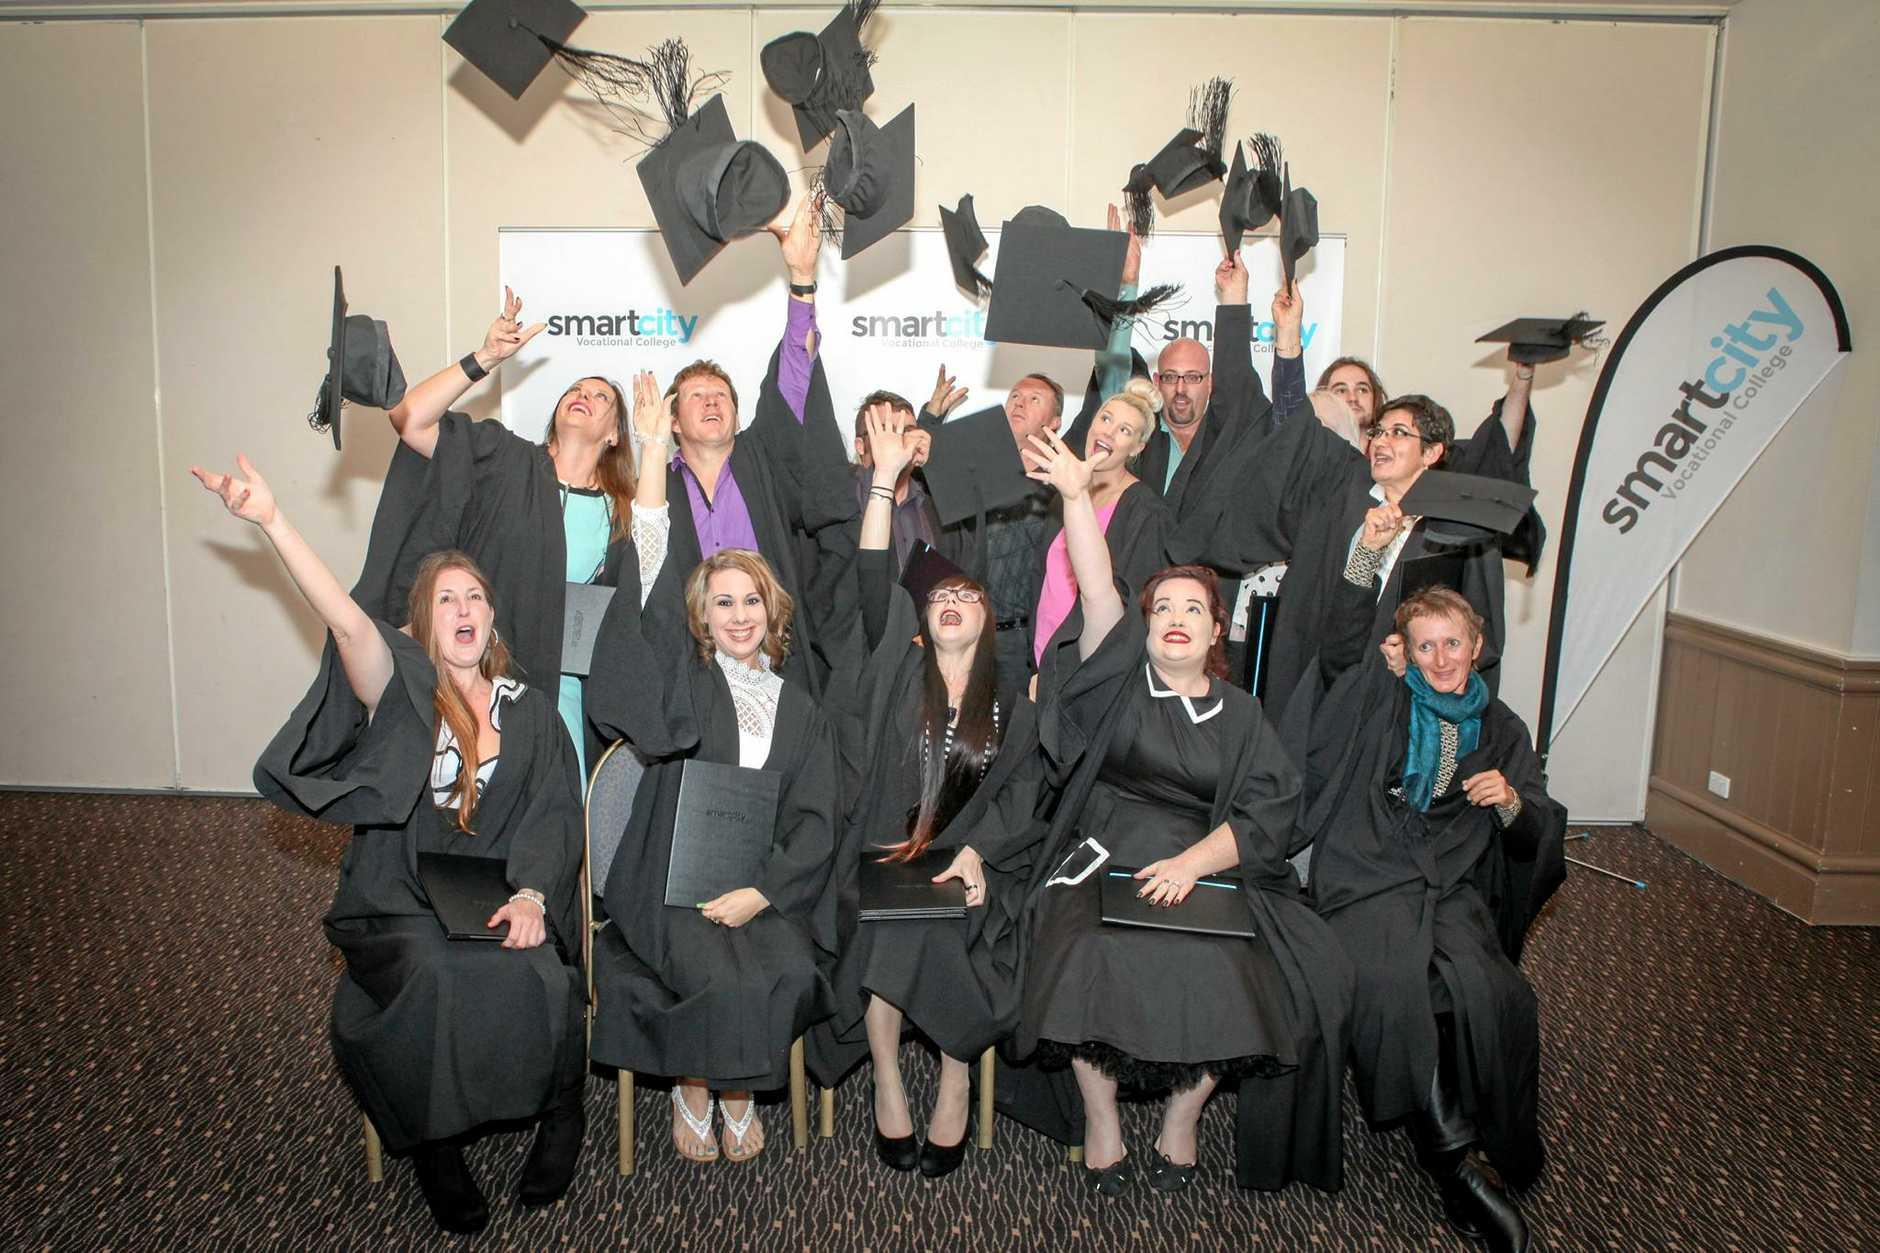 A SmartCity Graduating class celebrates in 2015.